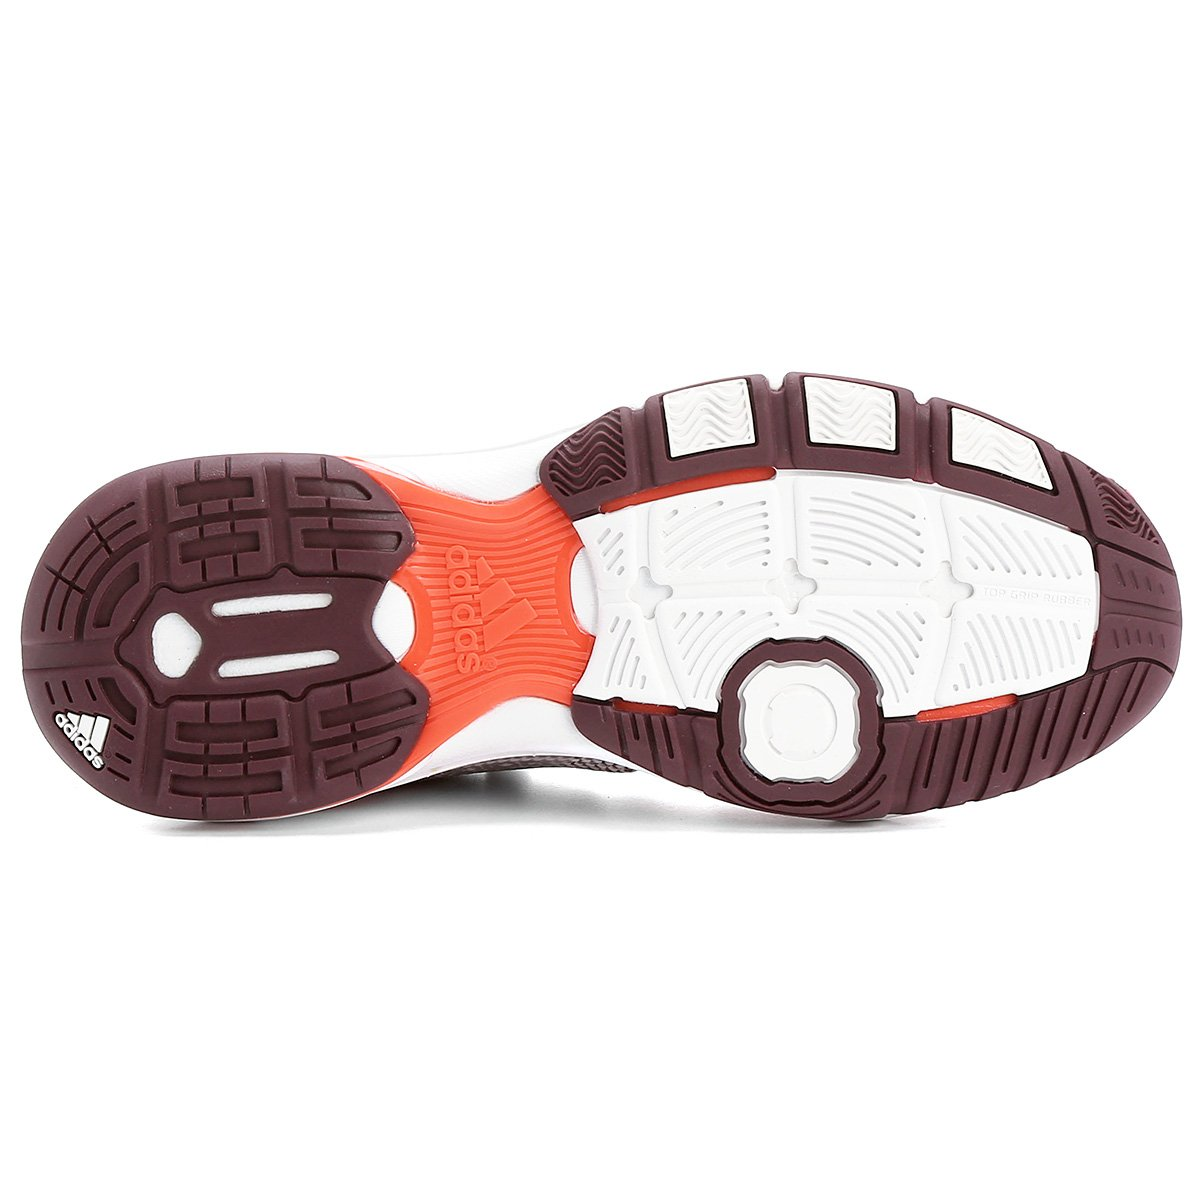 6b792a3a90 Tênis Adidas Court Stabil